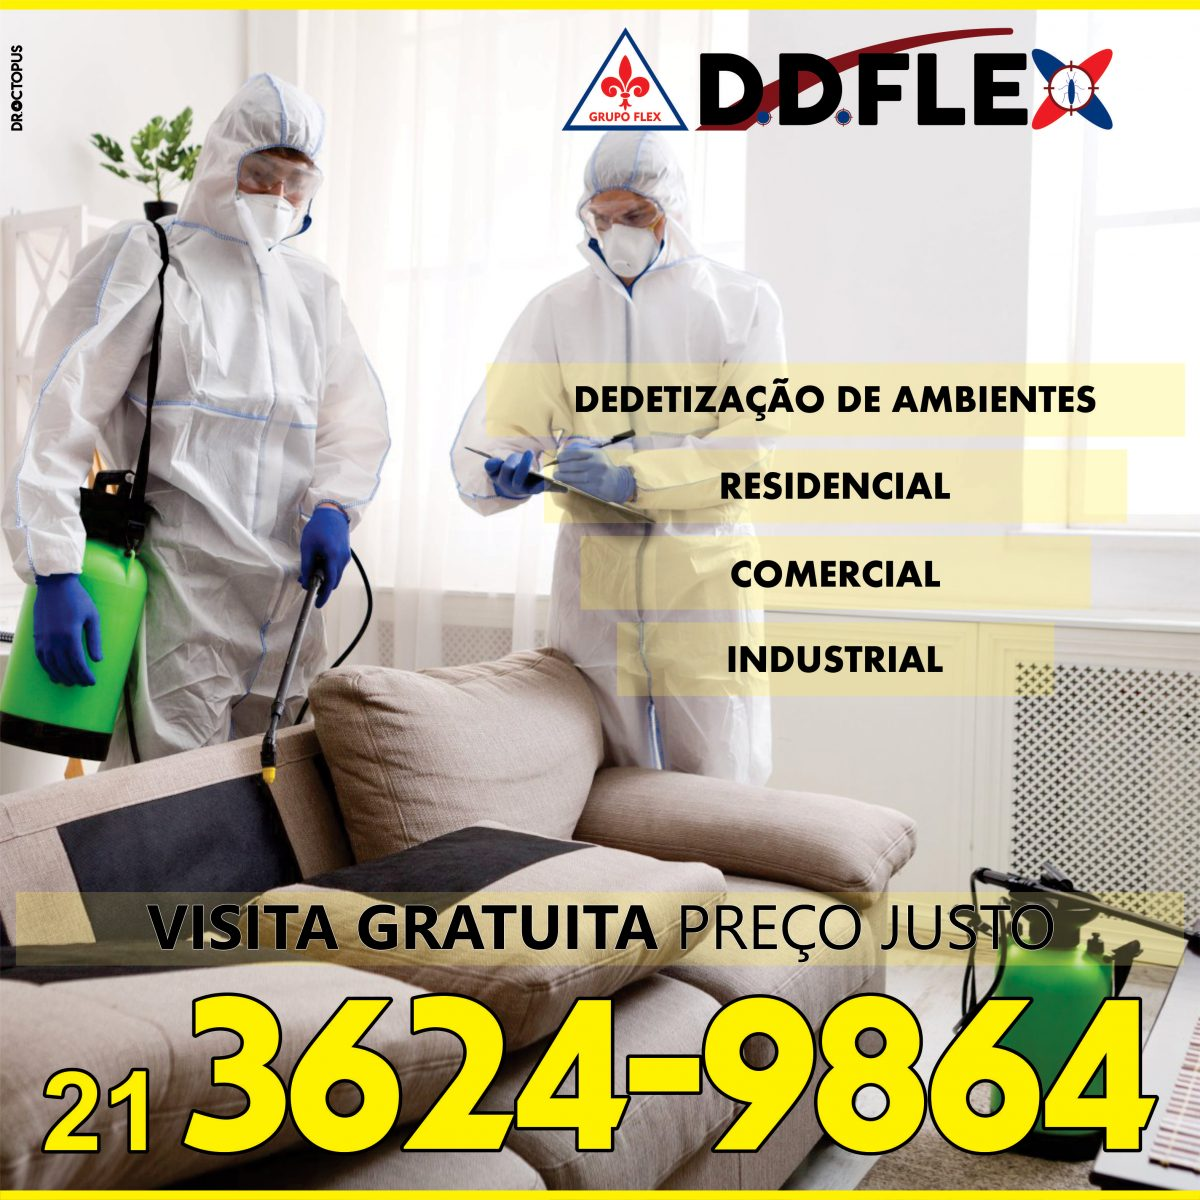 ddFLEX-2020-RJ